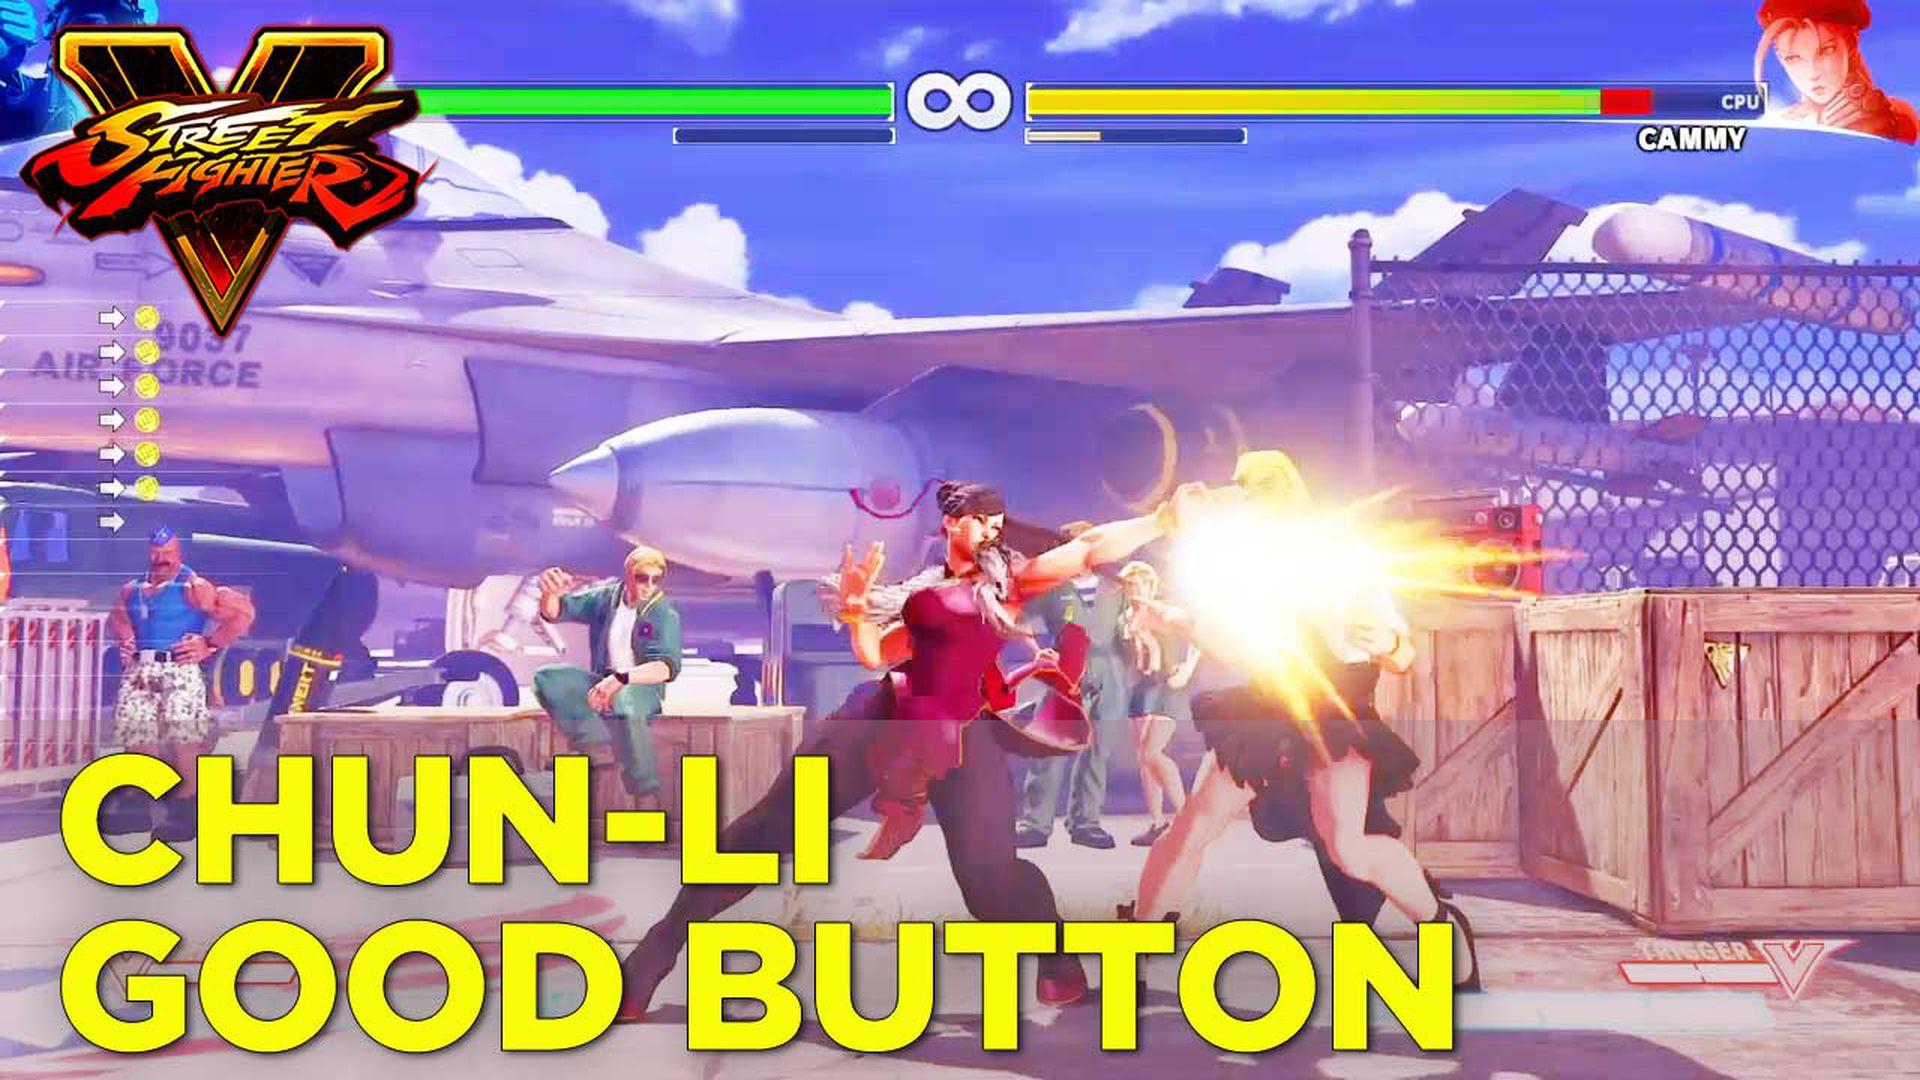 Https Www Polygon Com Street Fighter 5 Guide 2017 4 24 14612688